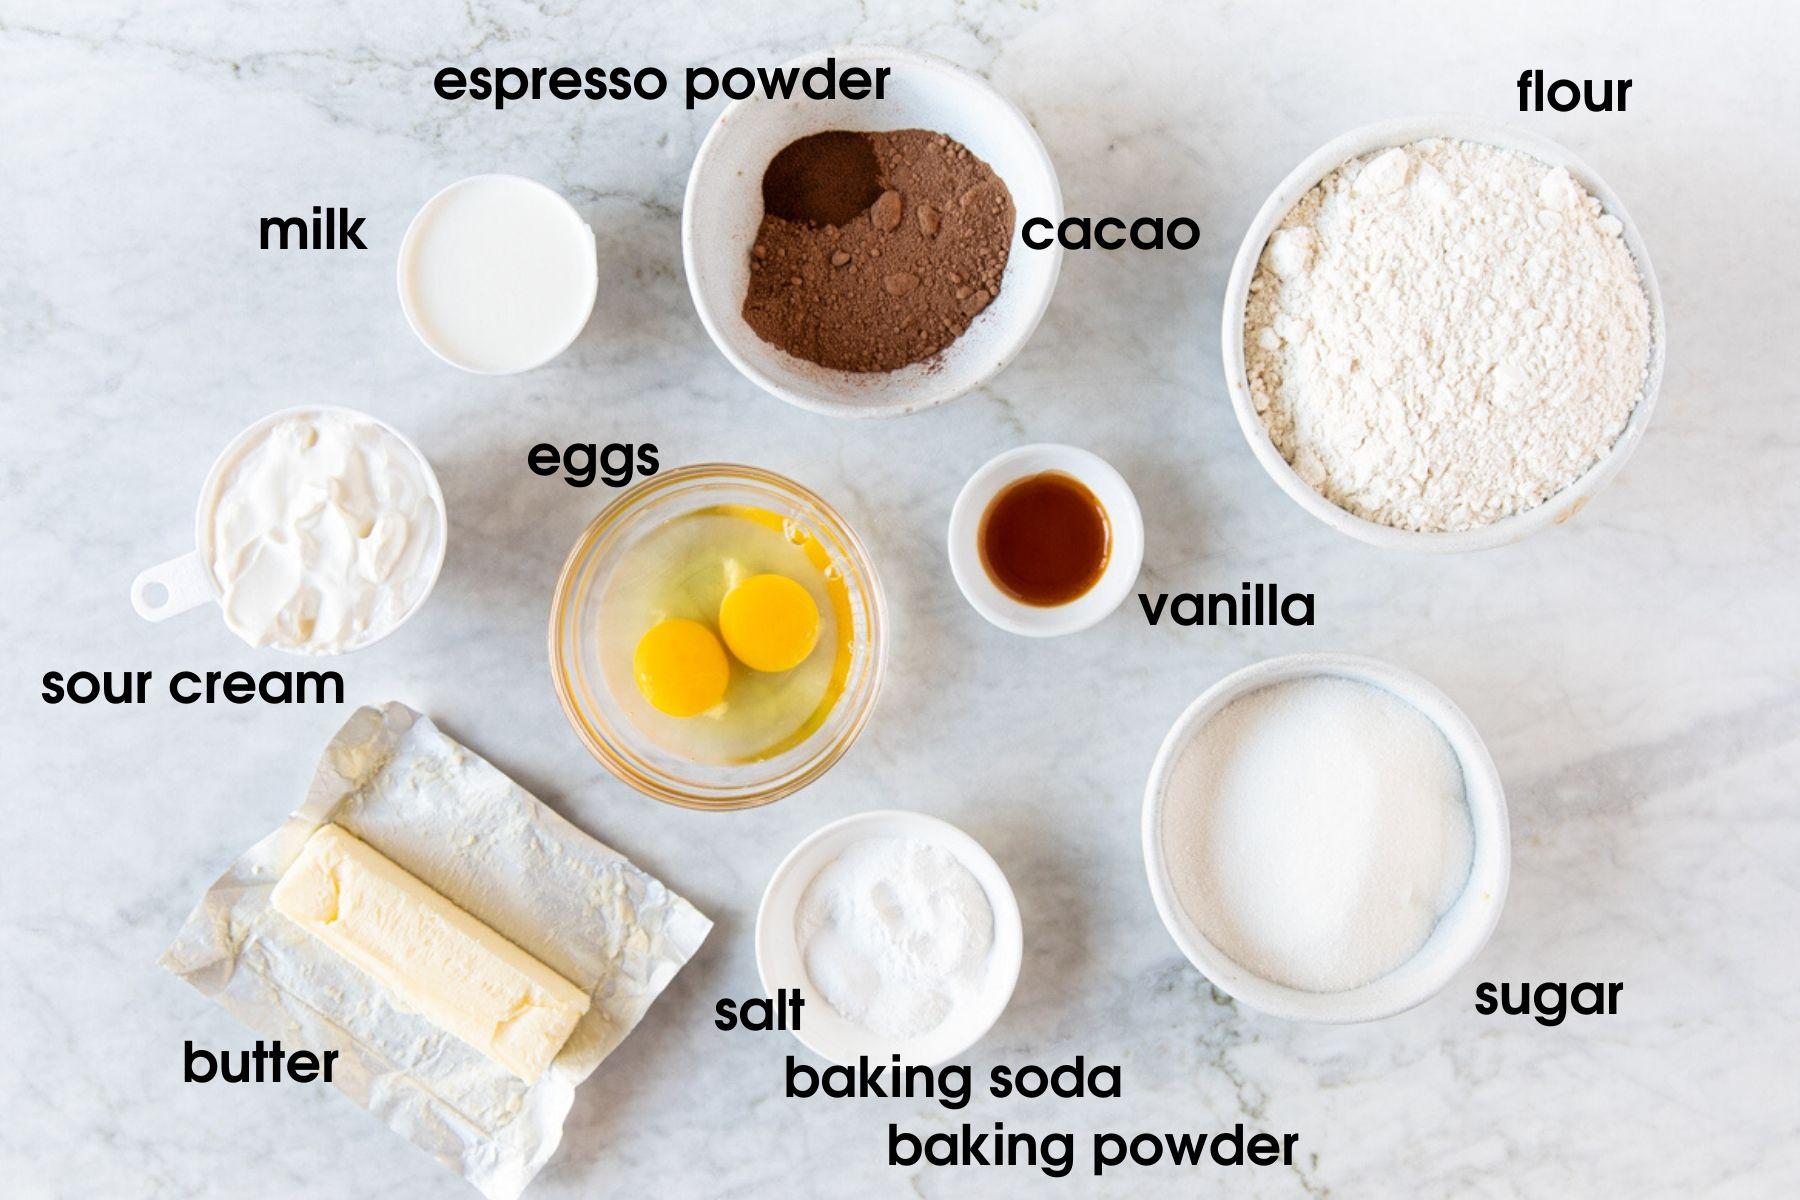 Vanilla Chocolate Marble Bundt Cake ingredients: milk, espresso powder, cacao, flour, vanilla extract, sugar, baking powder, baking soda, salt, eggs, butter, and sour cream